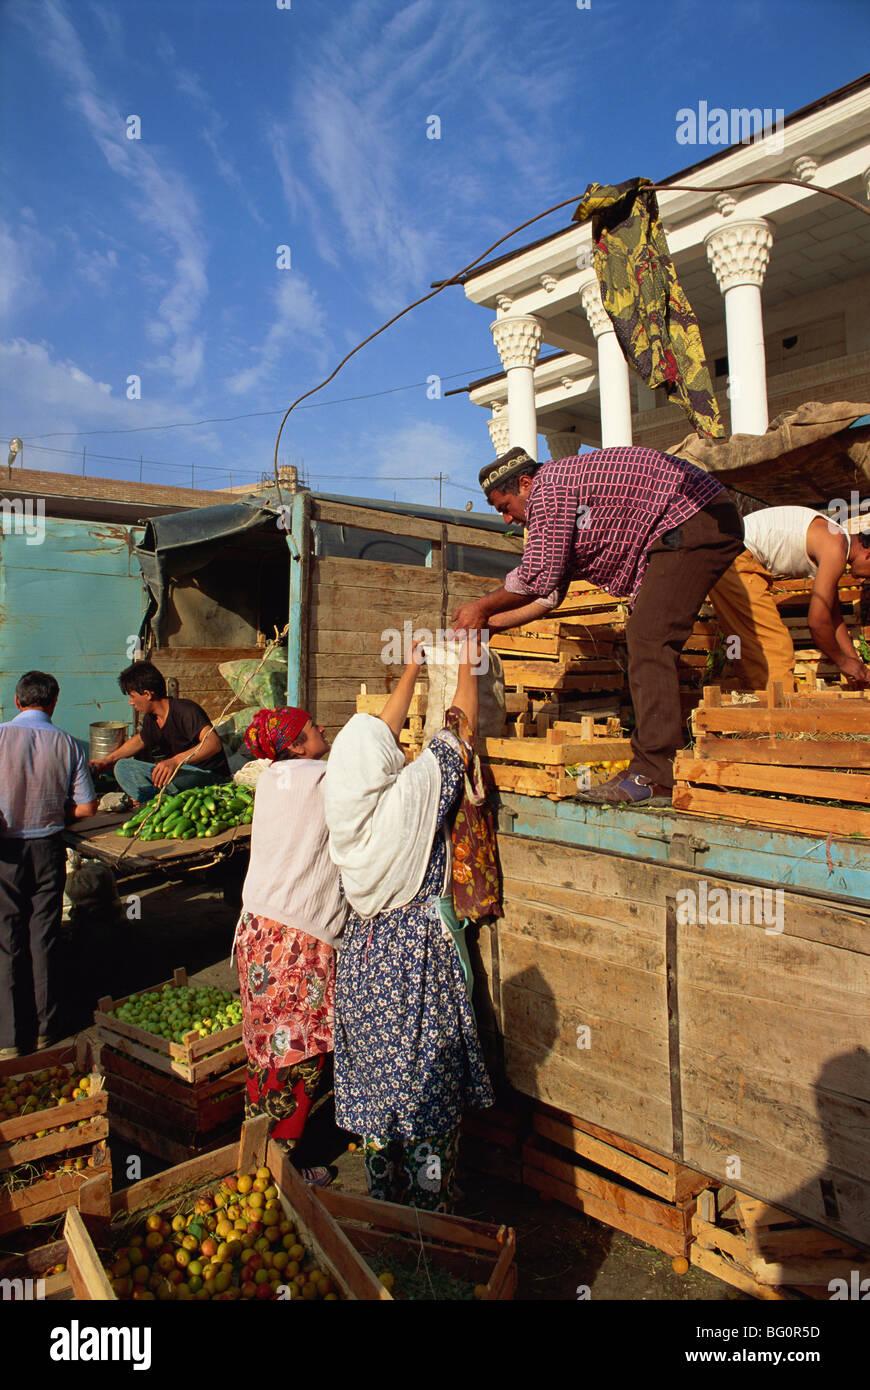 Unloading fruit in main food market, Samarkand, Uzbekistan, Central Asia, Asia - Stock Image